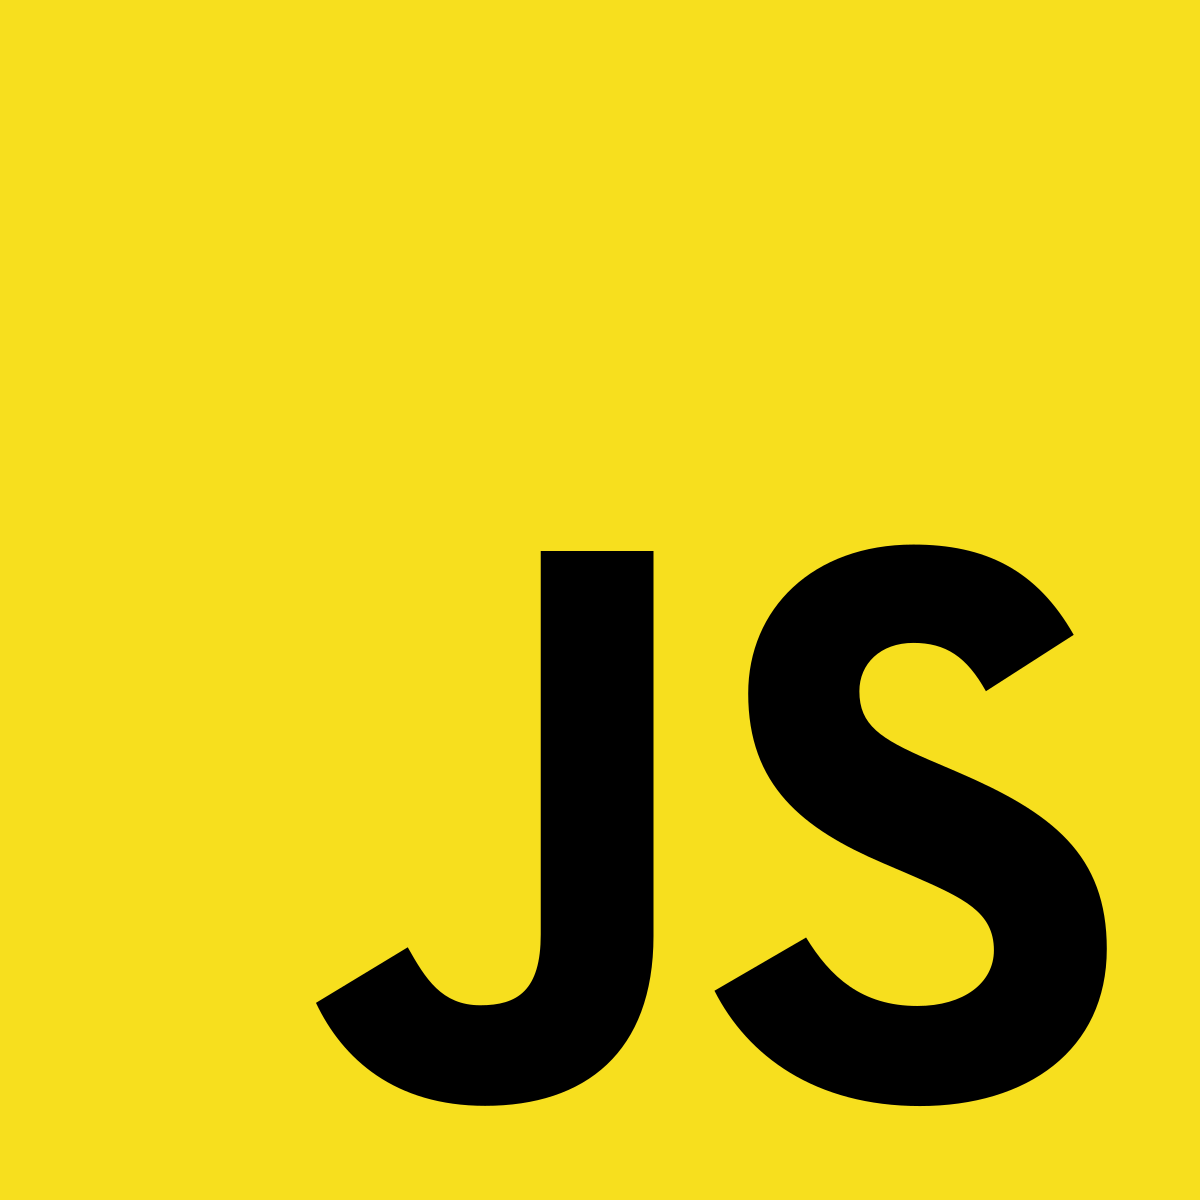 javascript-display-innerhtml-gwfbn